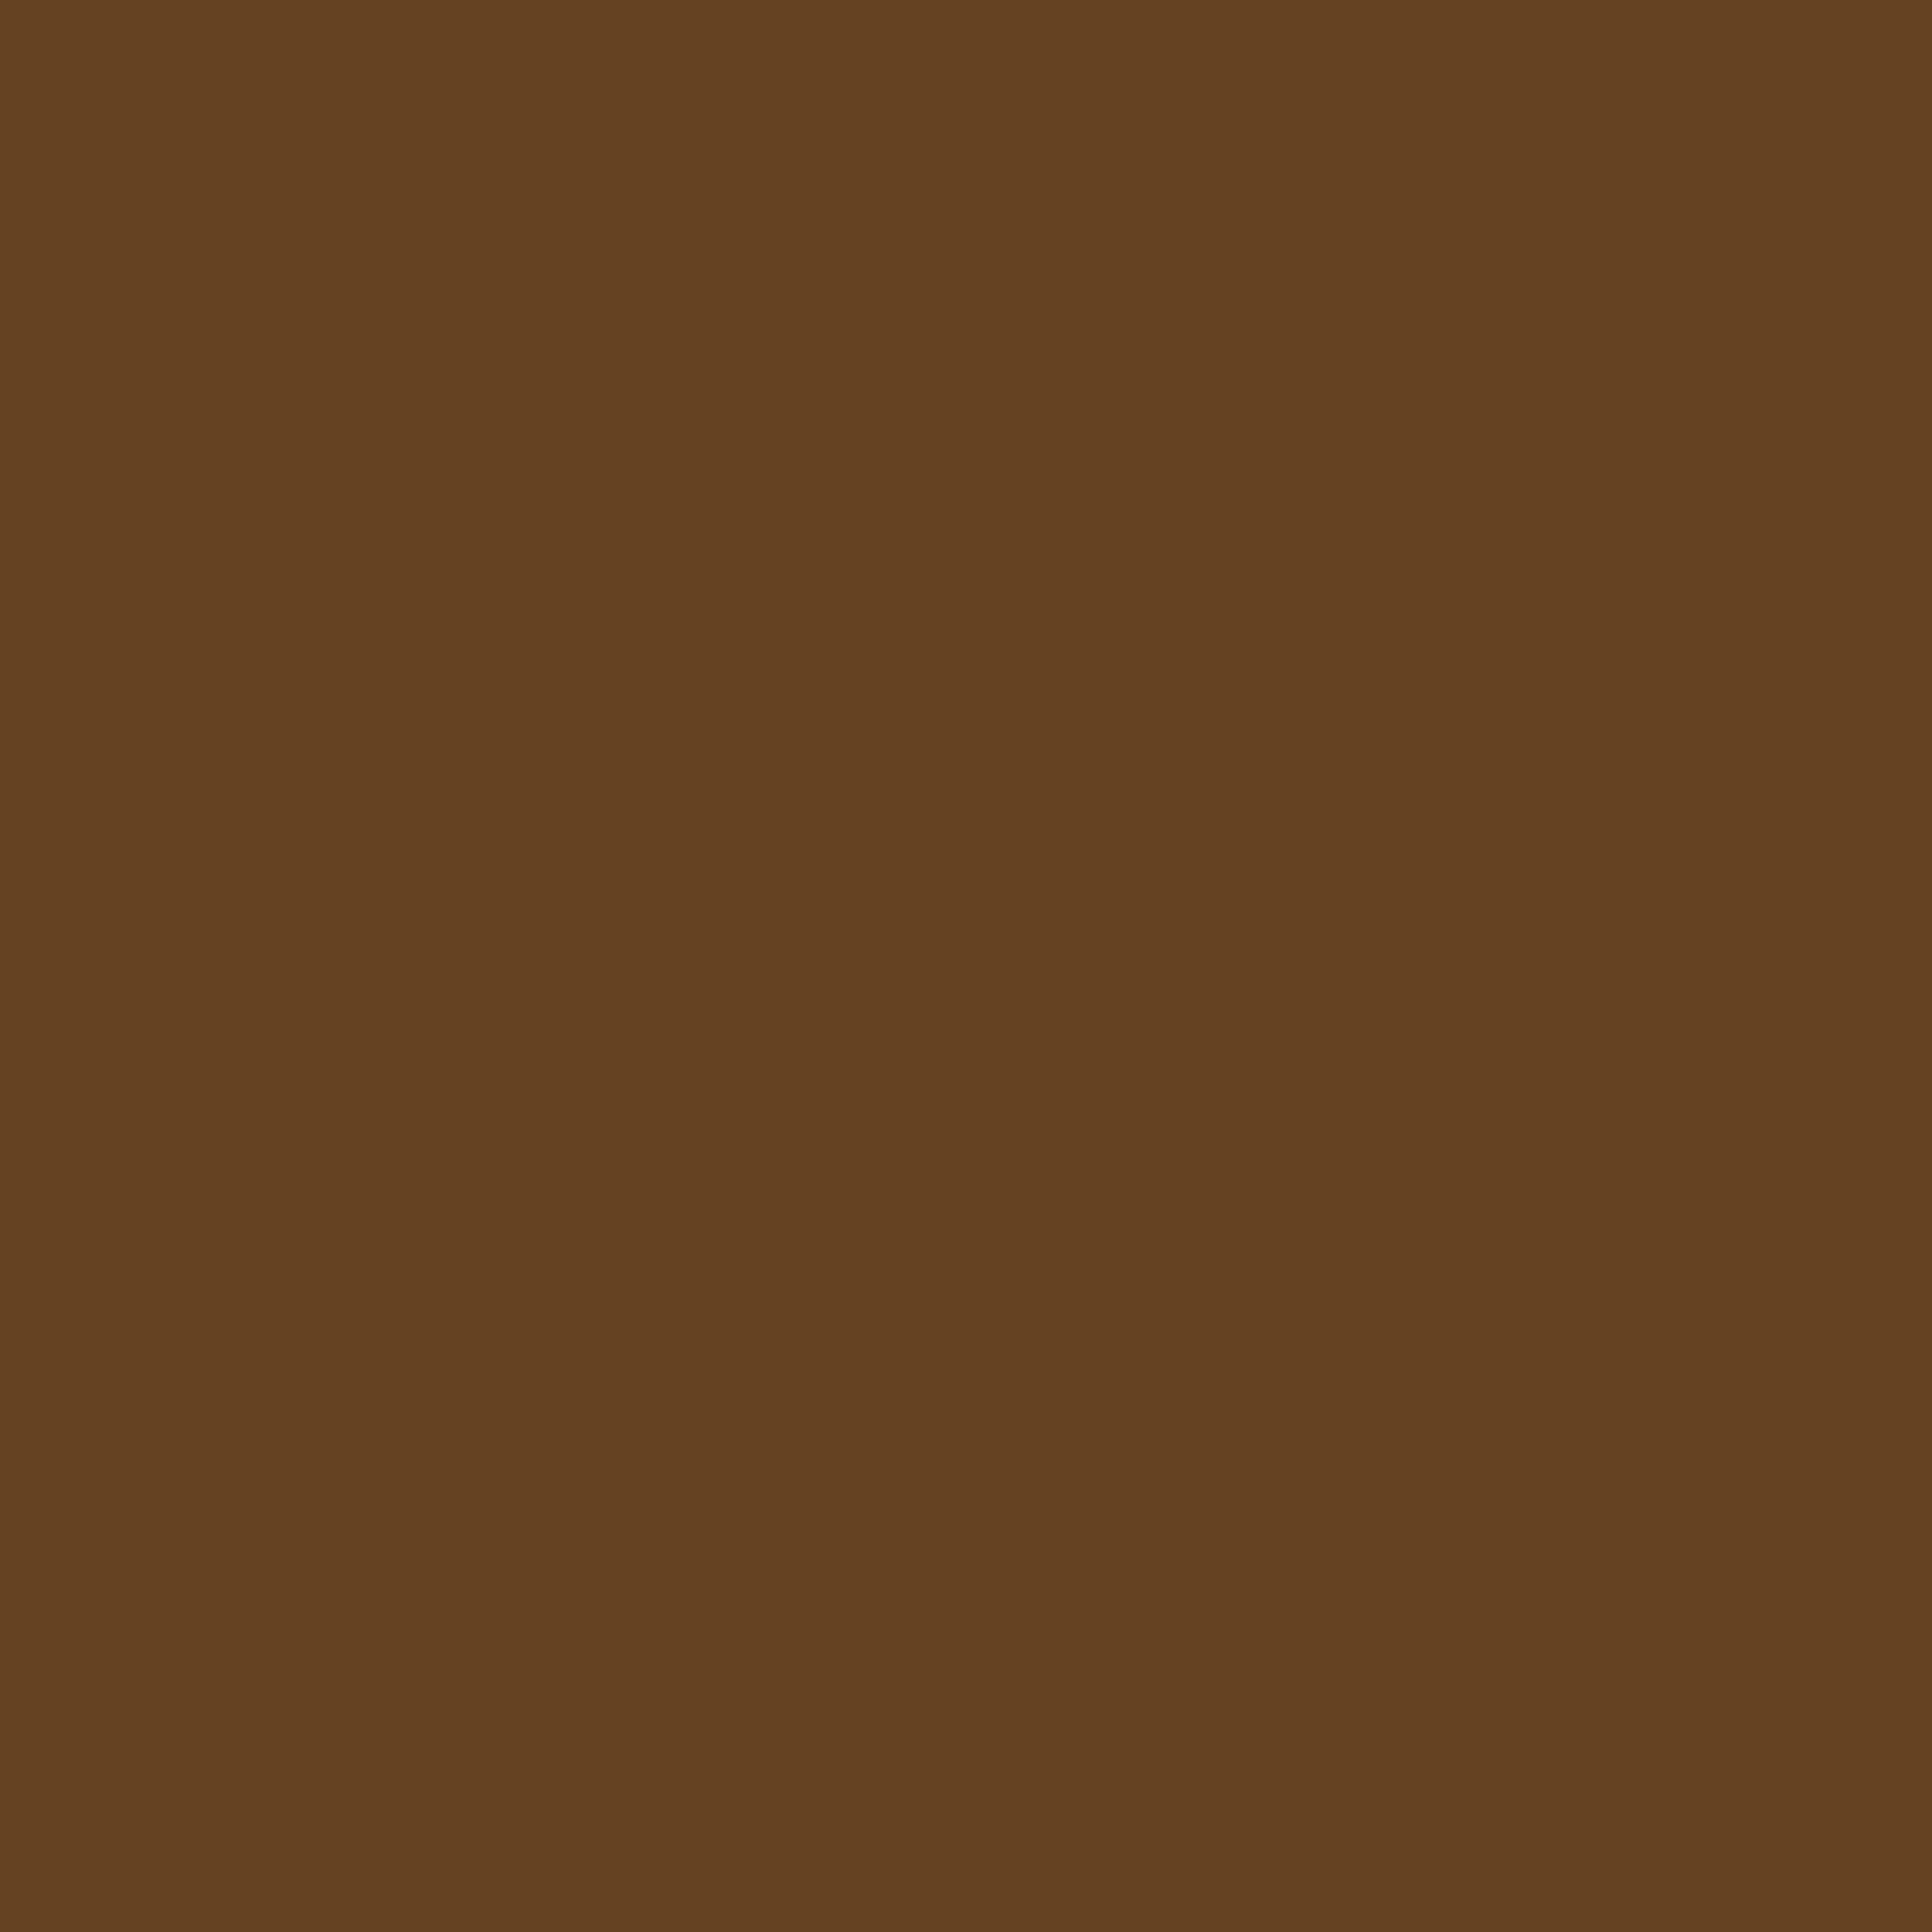 2048x2048 Dark Brown Solid Color Background